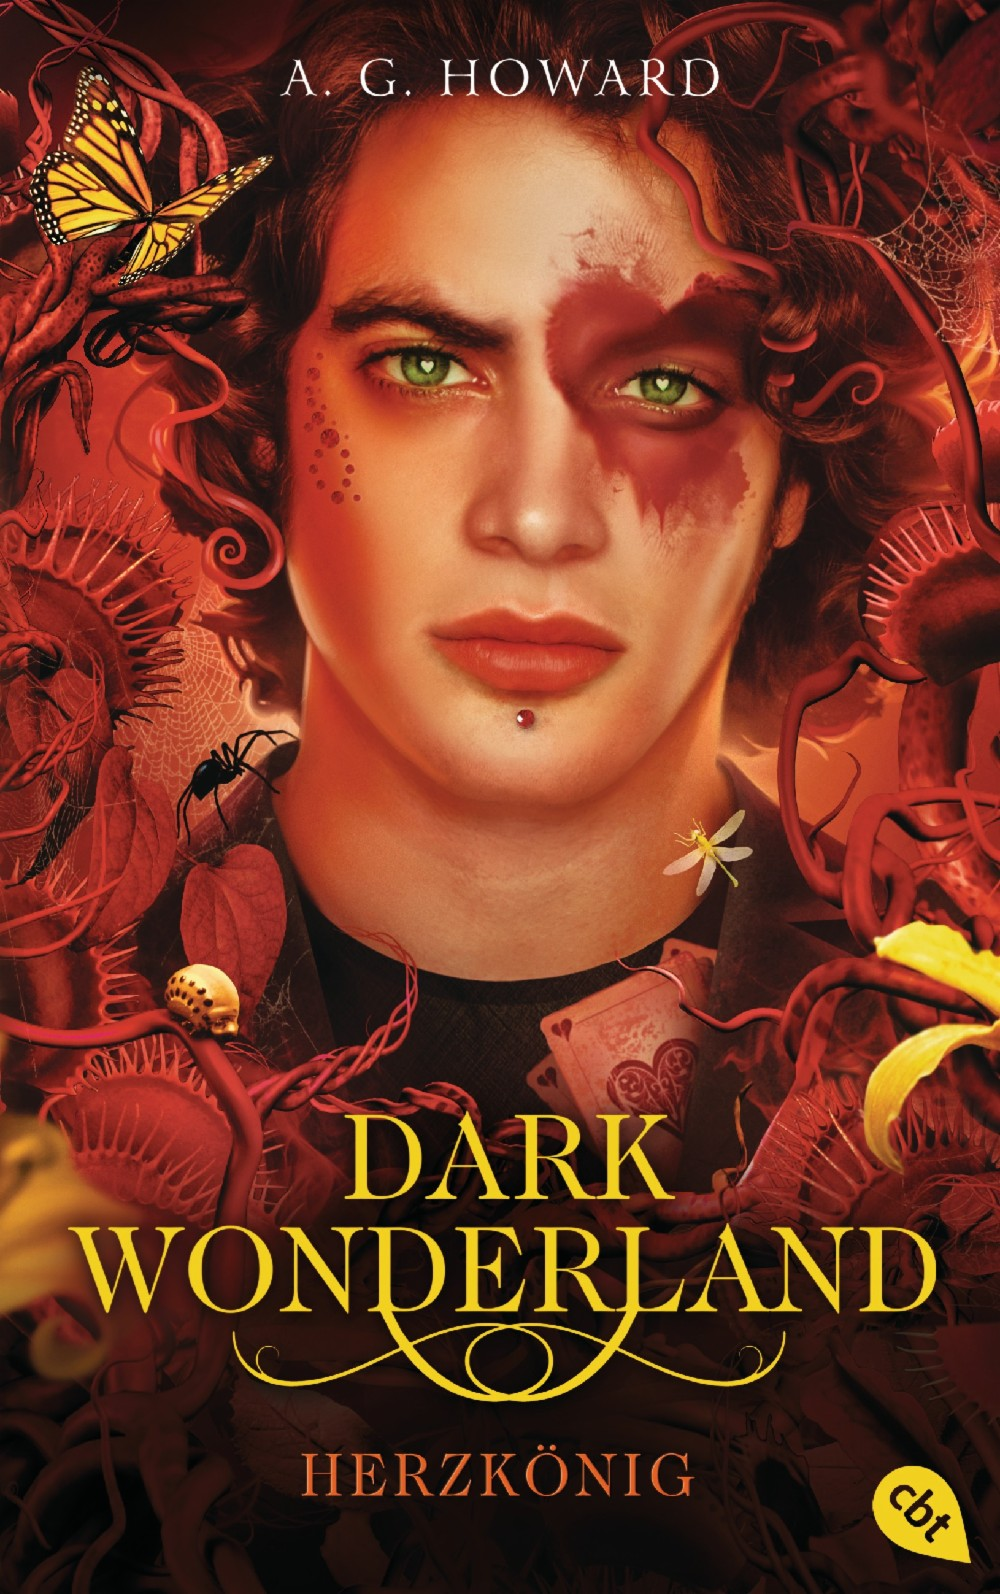 https://www.randomhouse.de/Buch/Dark-Wonderland-Herzkoenig/A.G.-Howard/cbt/e491601.rhd